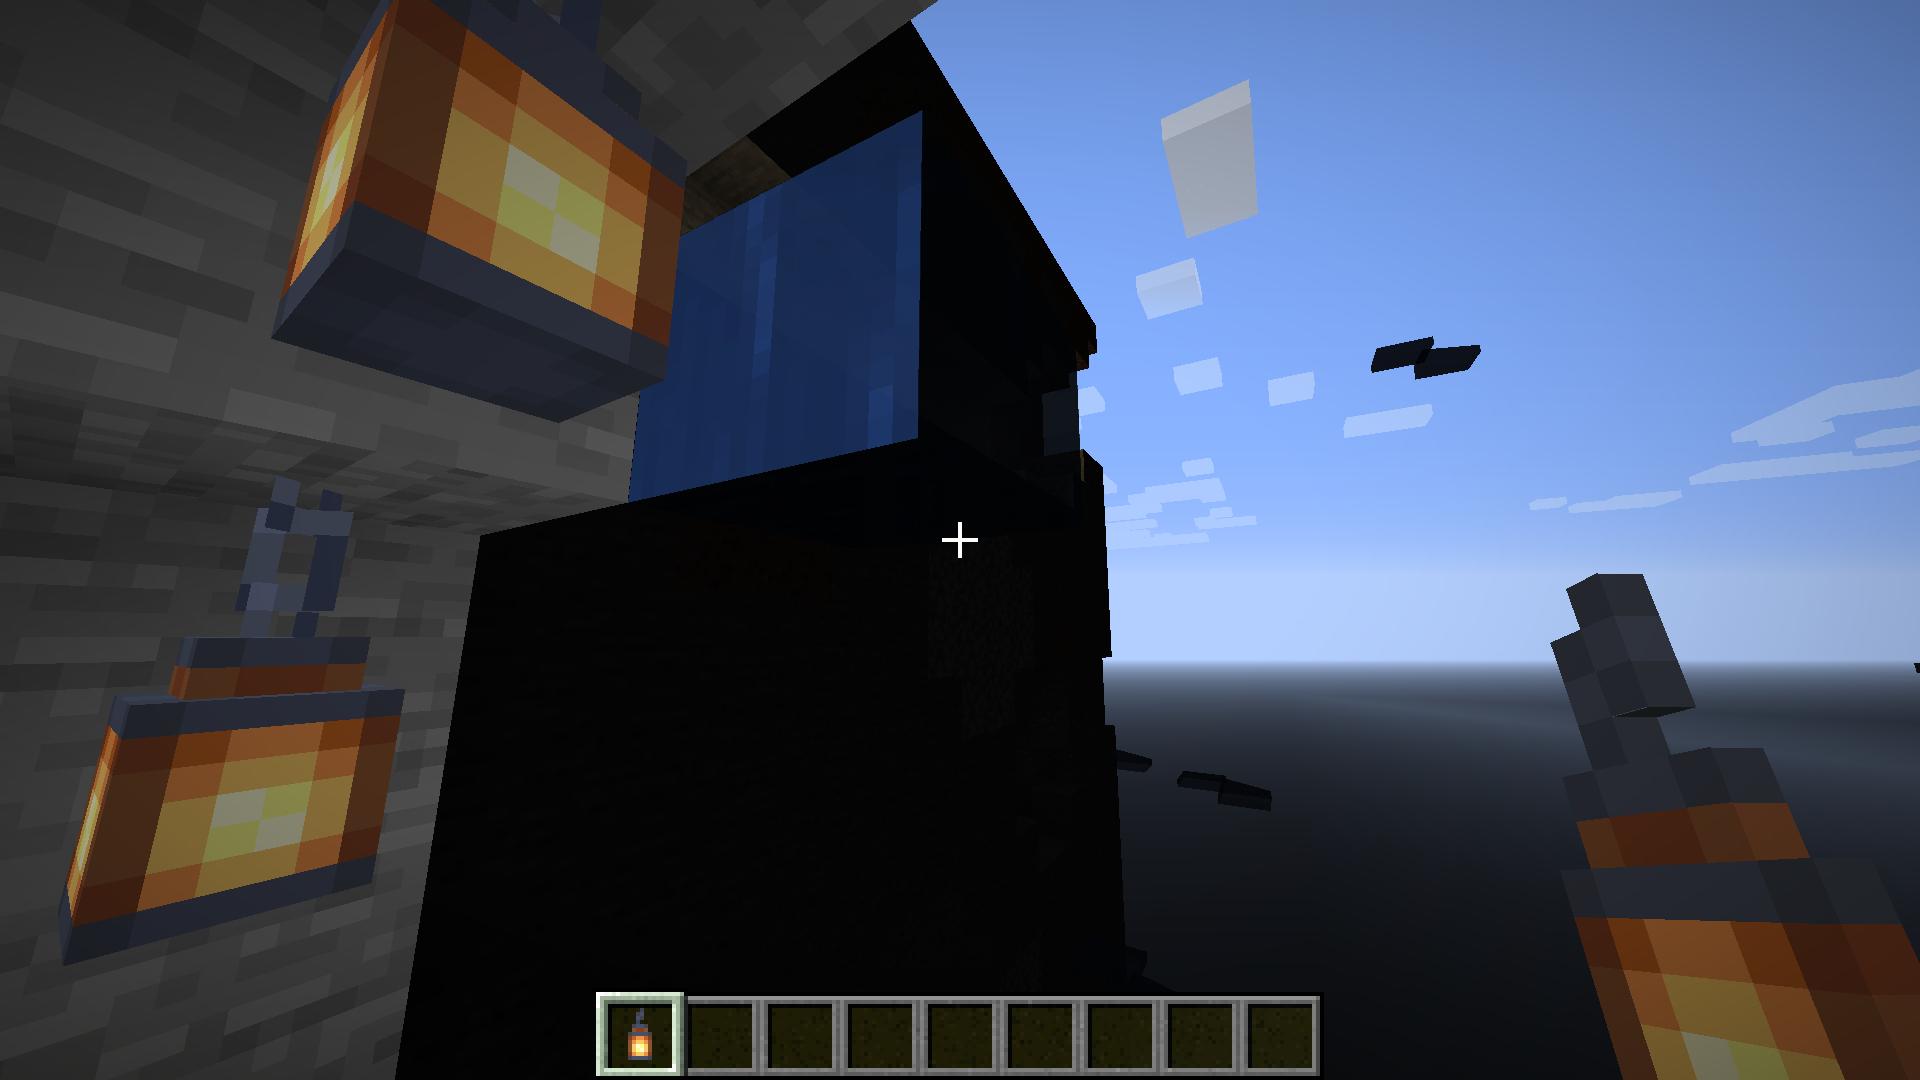 MC-139717] Game hangs while trying to load chunks - Jira